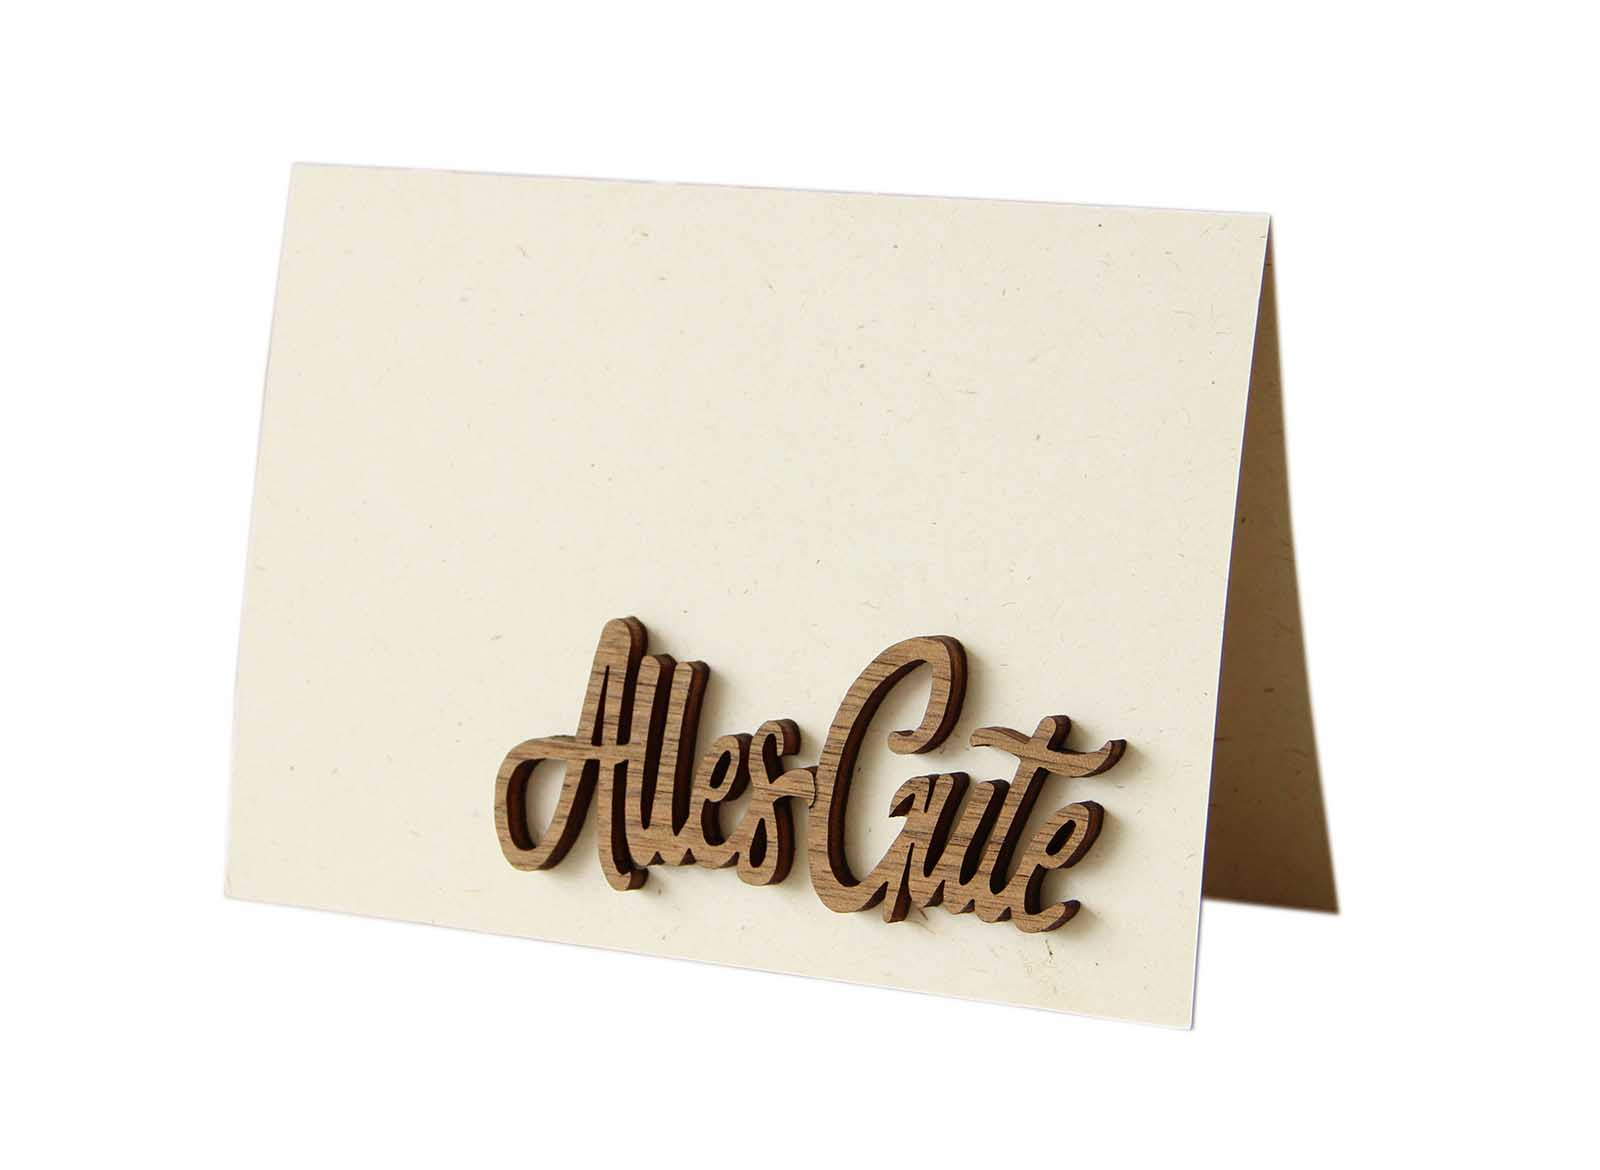 "Holzgrußkarte - Papierkarte mit Schriftzug aus Echtholz in Nuss ""Alles Gute"", Postkarte, Geschenkkarte, Klappkarte, Karte, Geburtstagskarte"